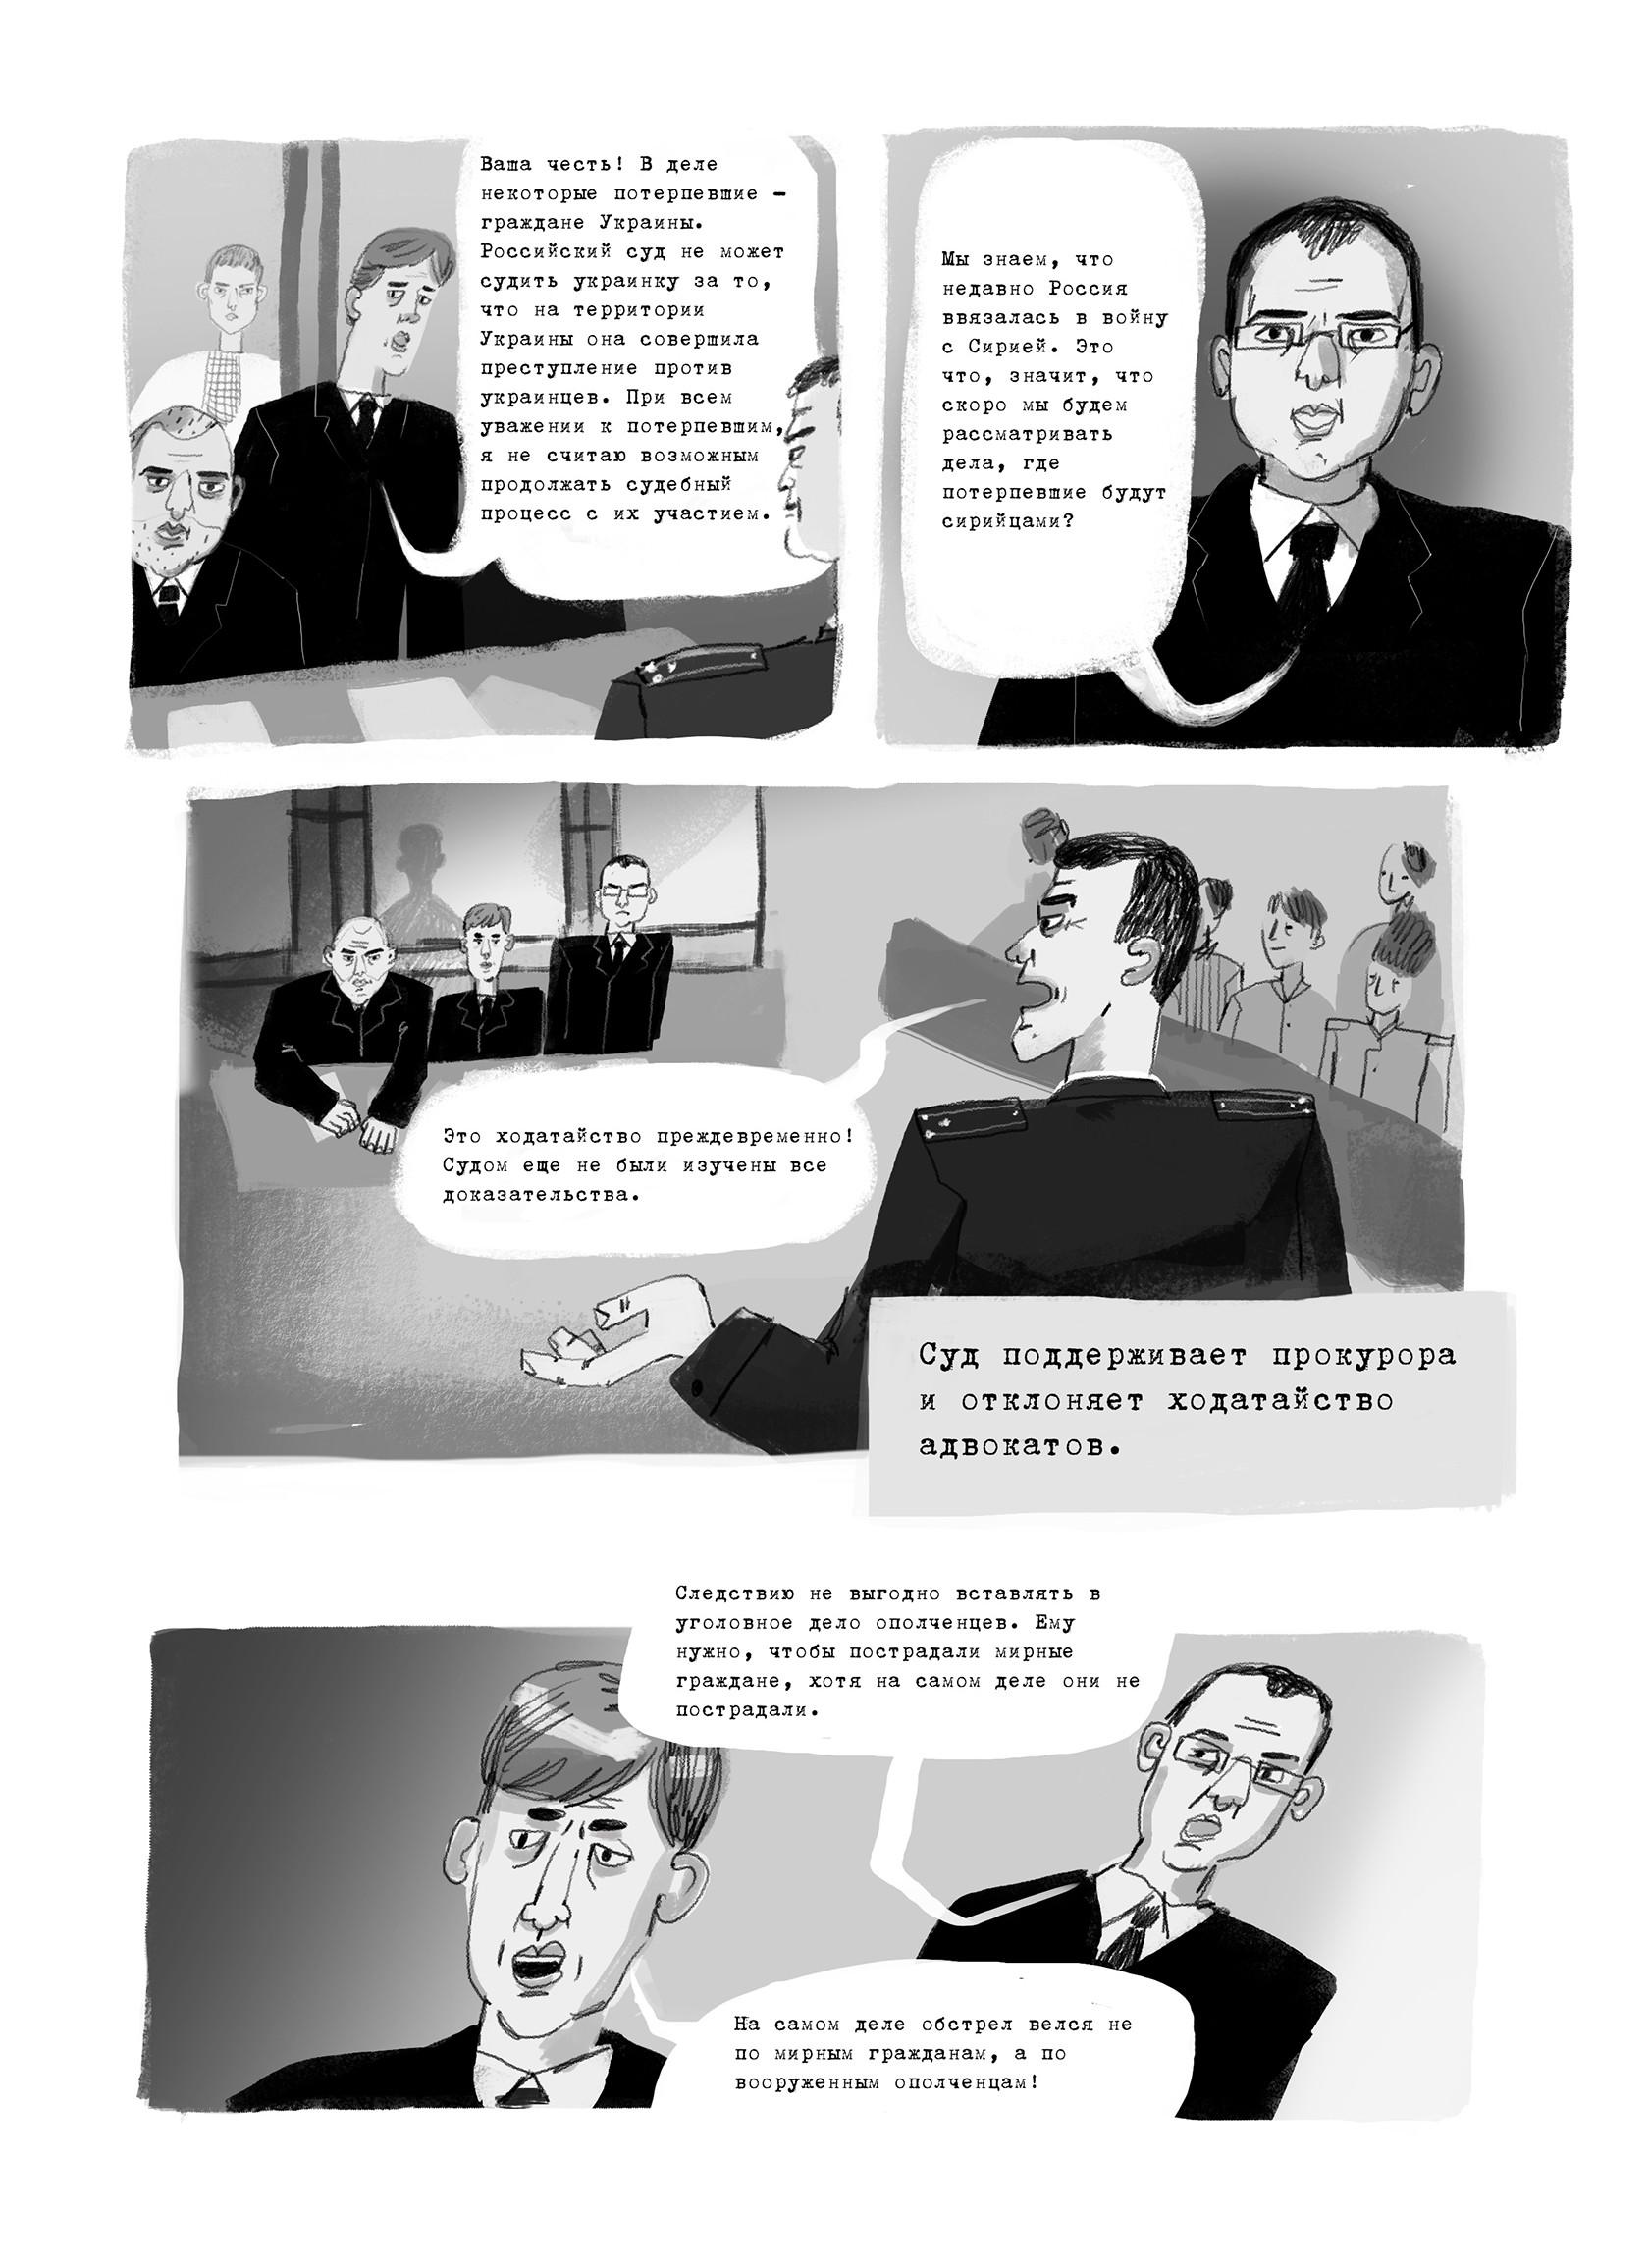 В Росії Савченко стала героїнею коміксу - фото 2